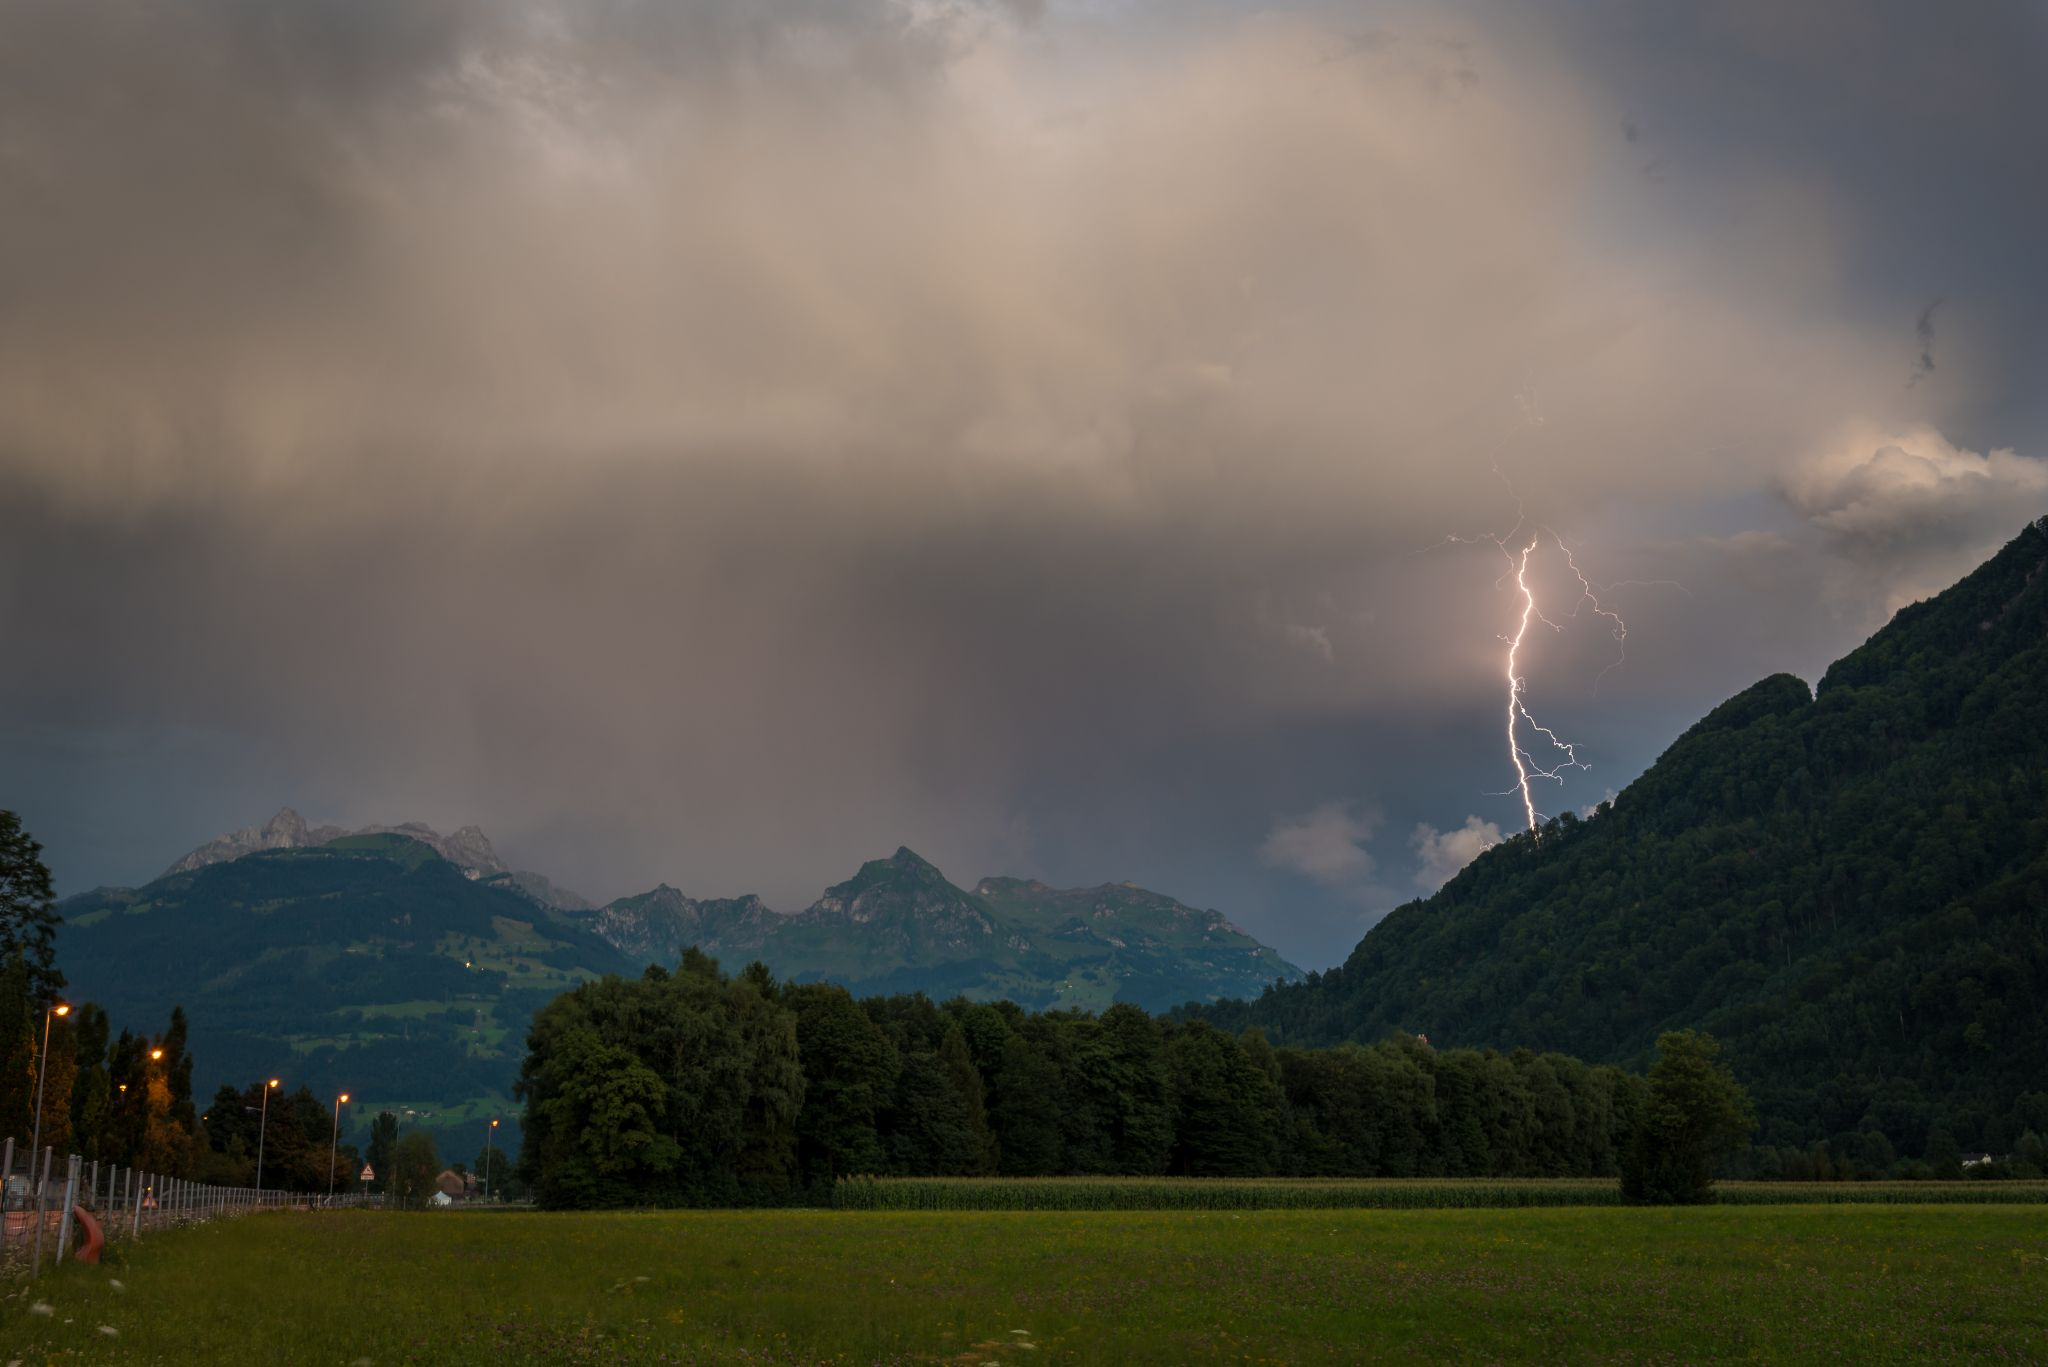 Gewitter in den Bergen, Switzerland